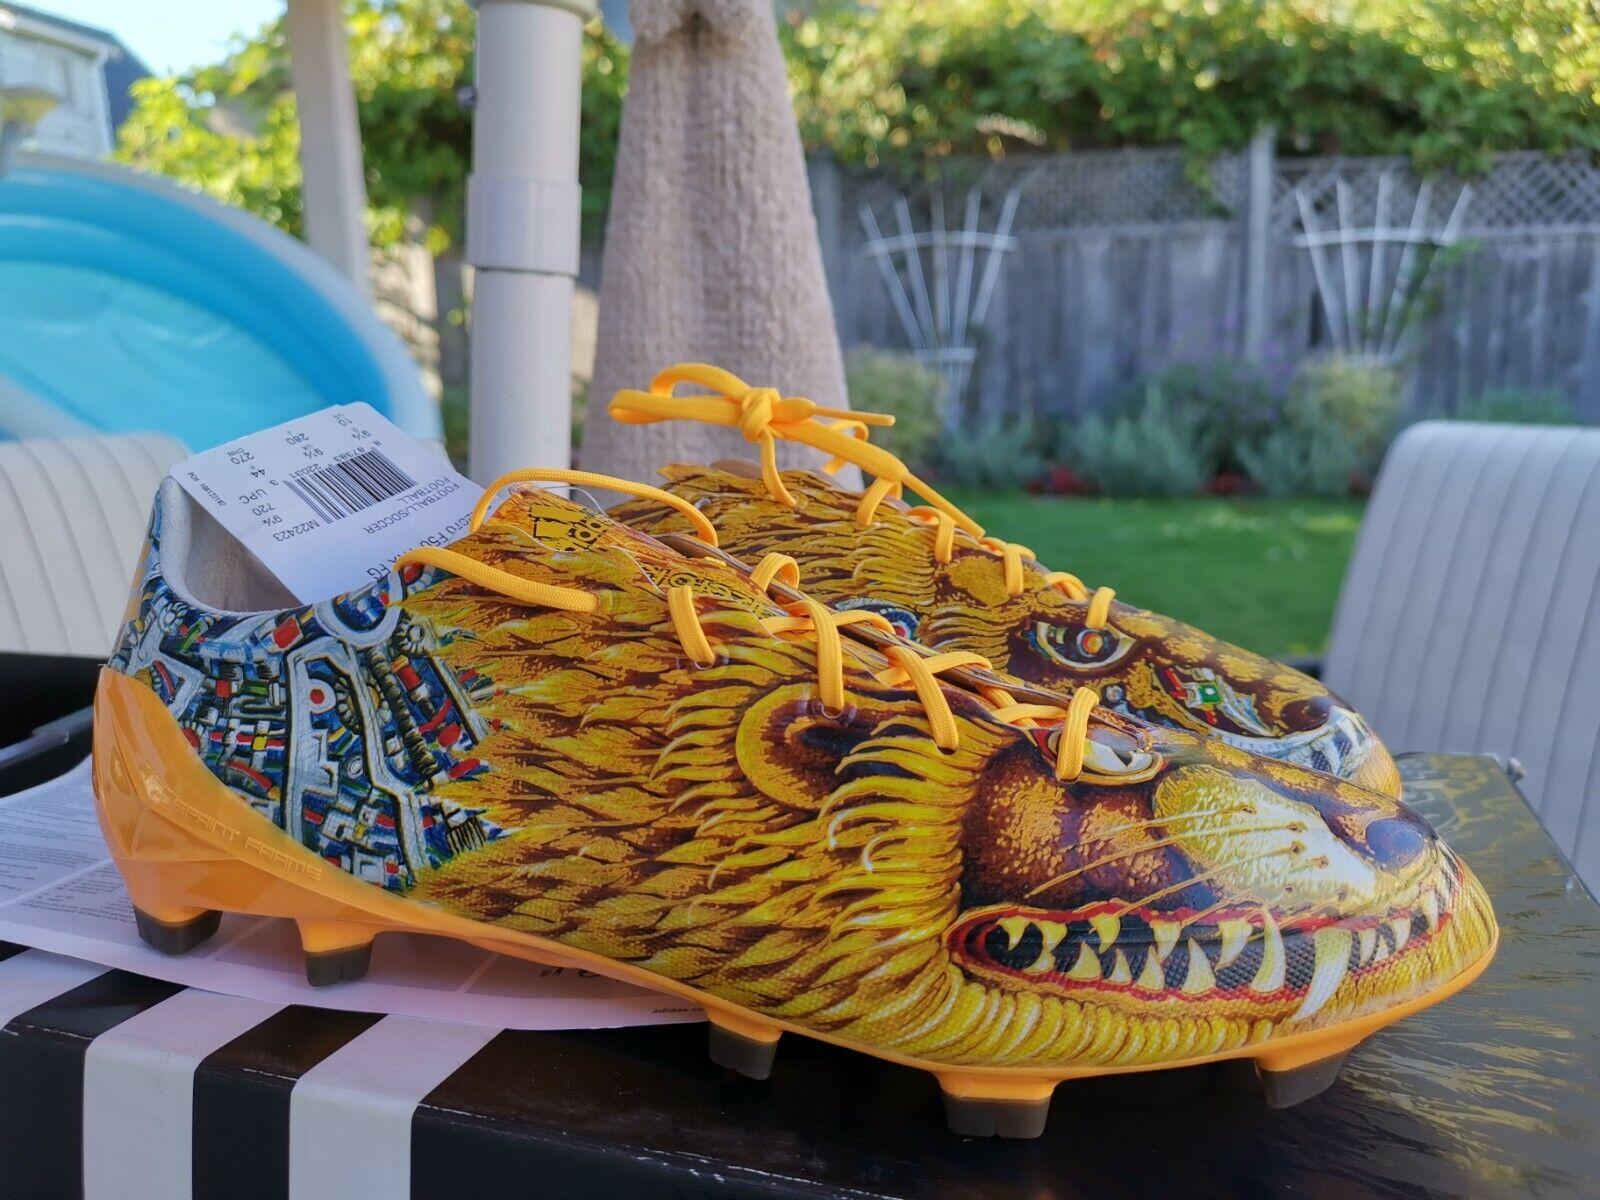 Mayo Rareza Día del Niño  Mens Sz 10 adidas F50 Adizero Y-3 Yamamoto Limited Ed Soccer Shoes/cleats  M21944 for sale online   eBay